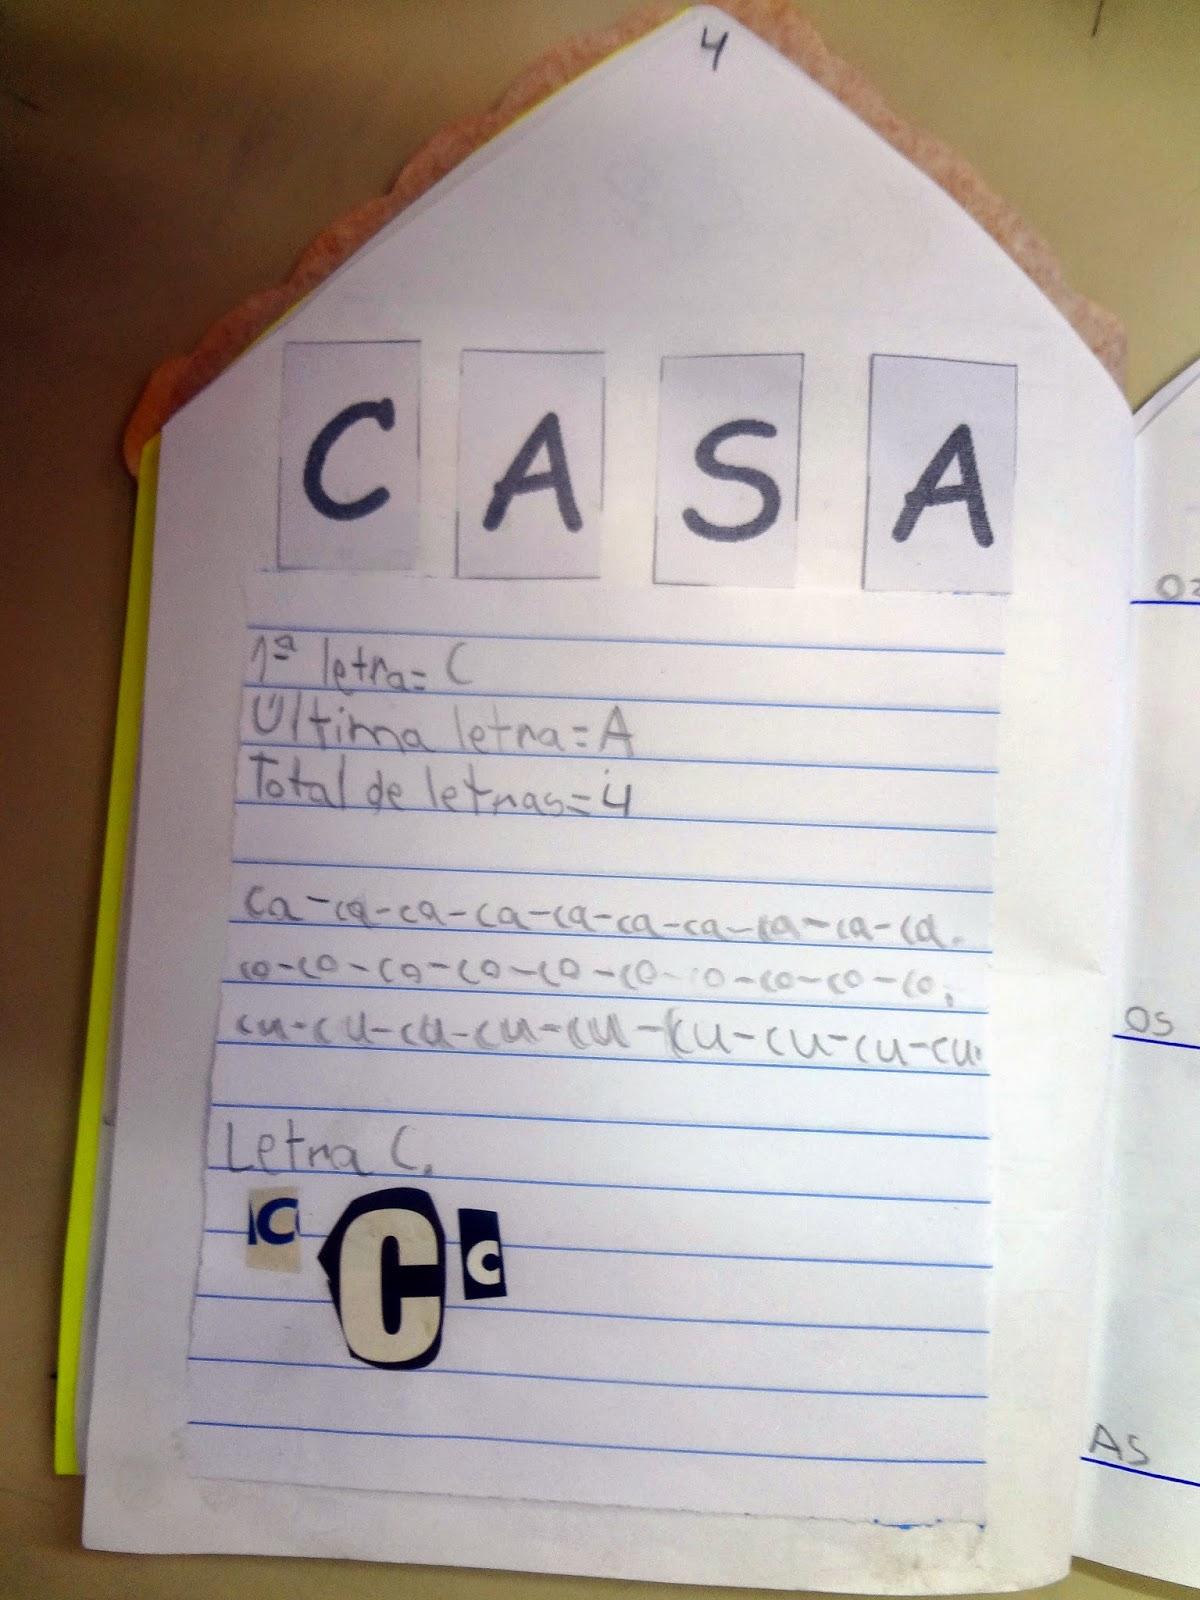 Prof Carllinha Letra C de Casa